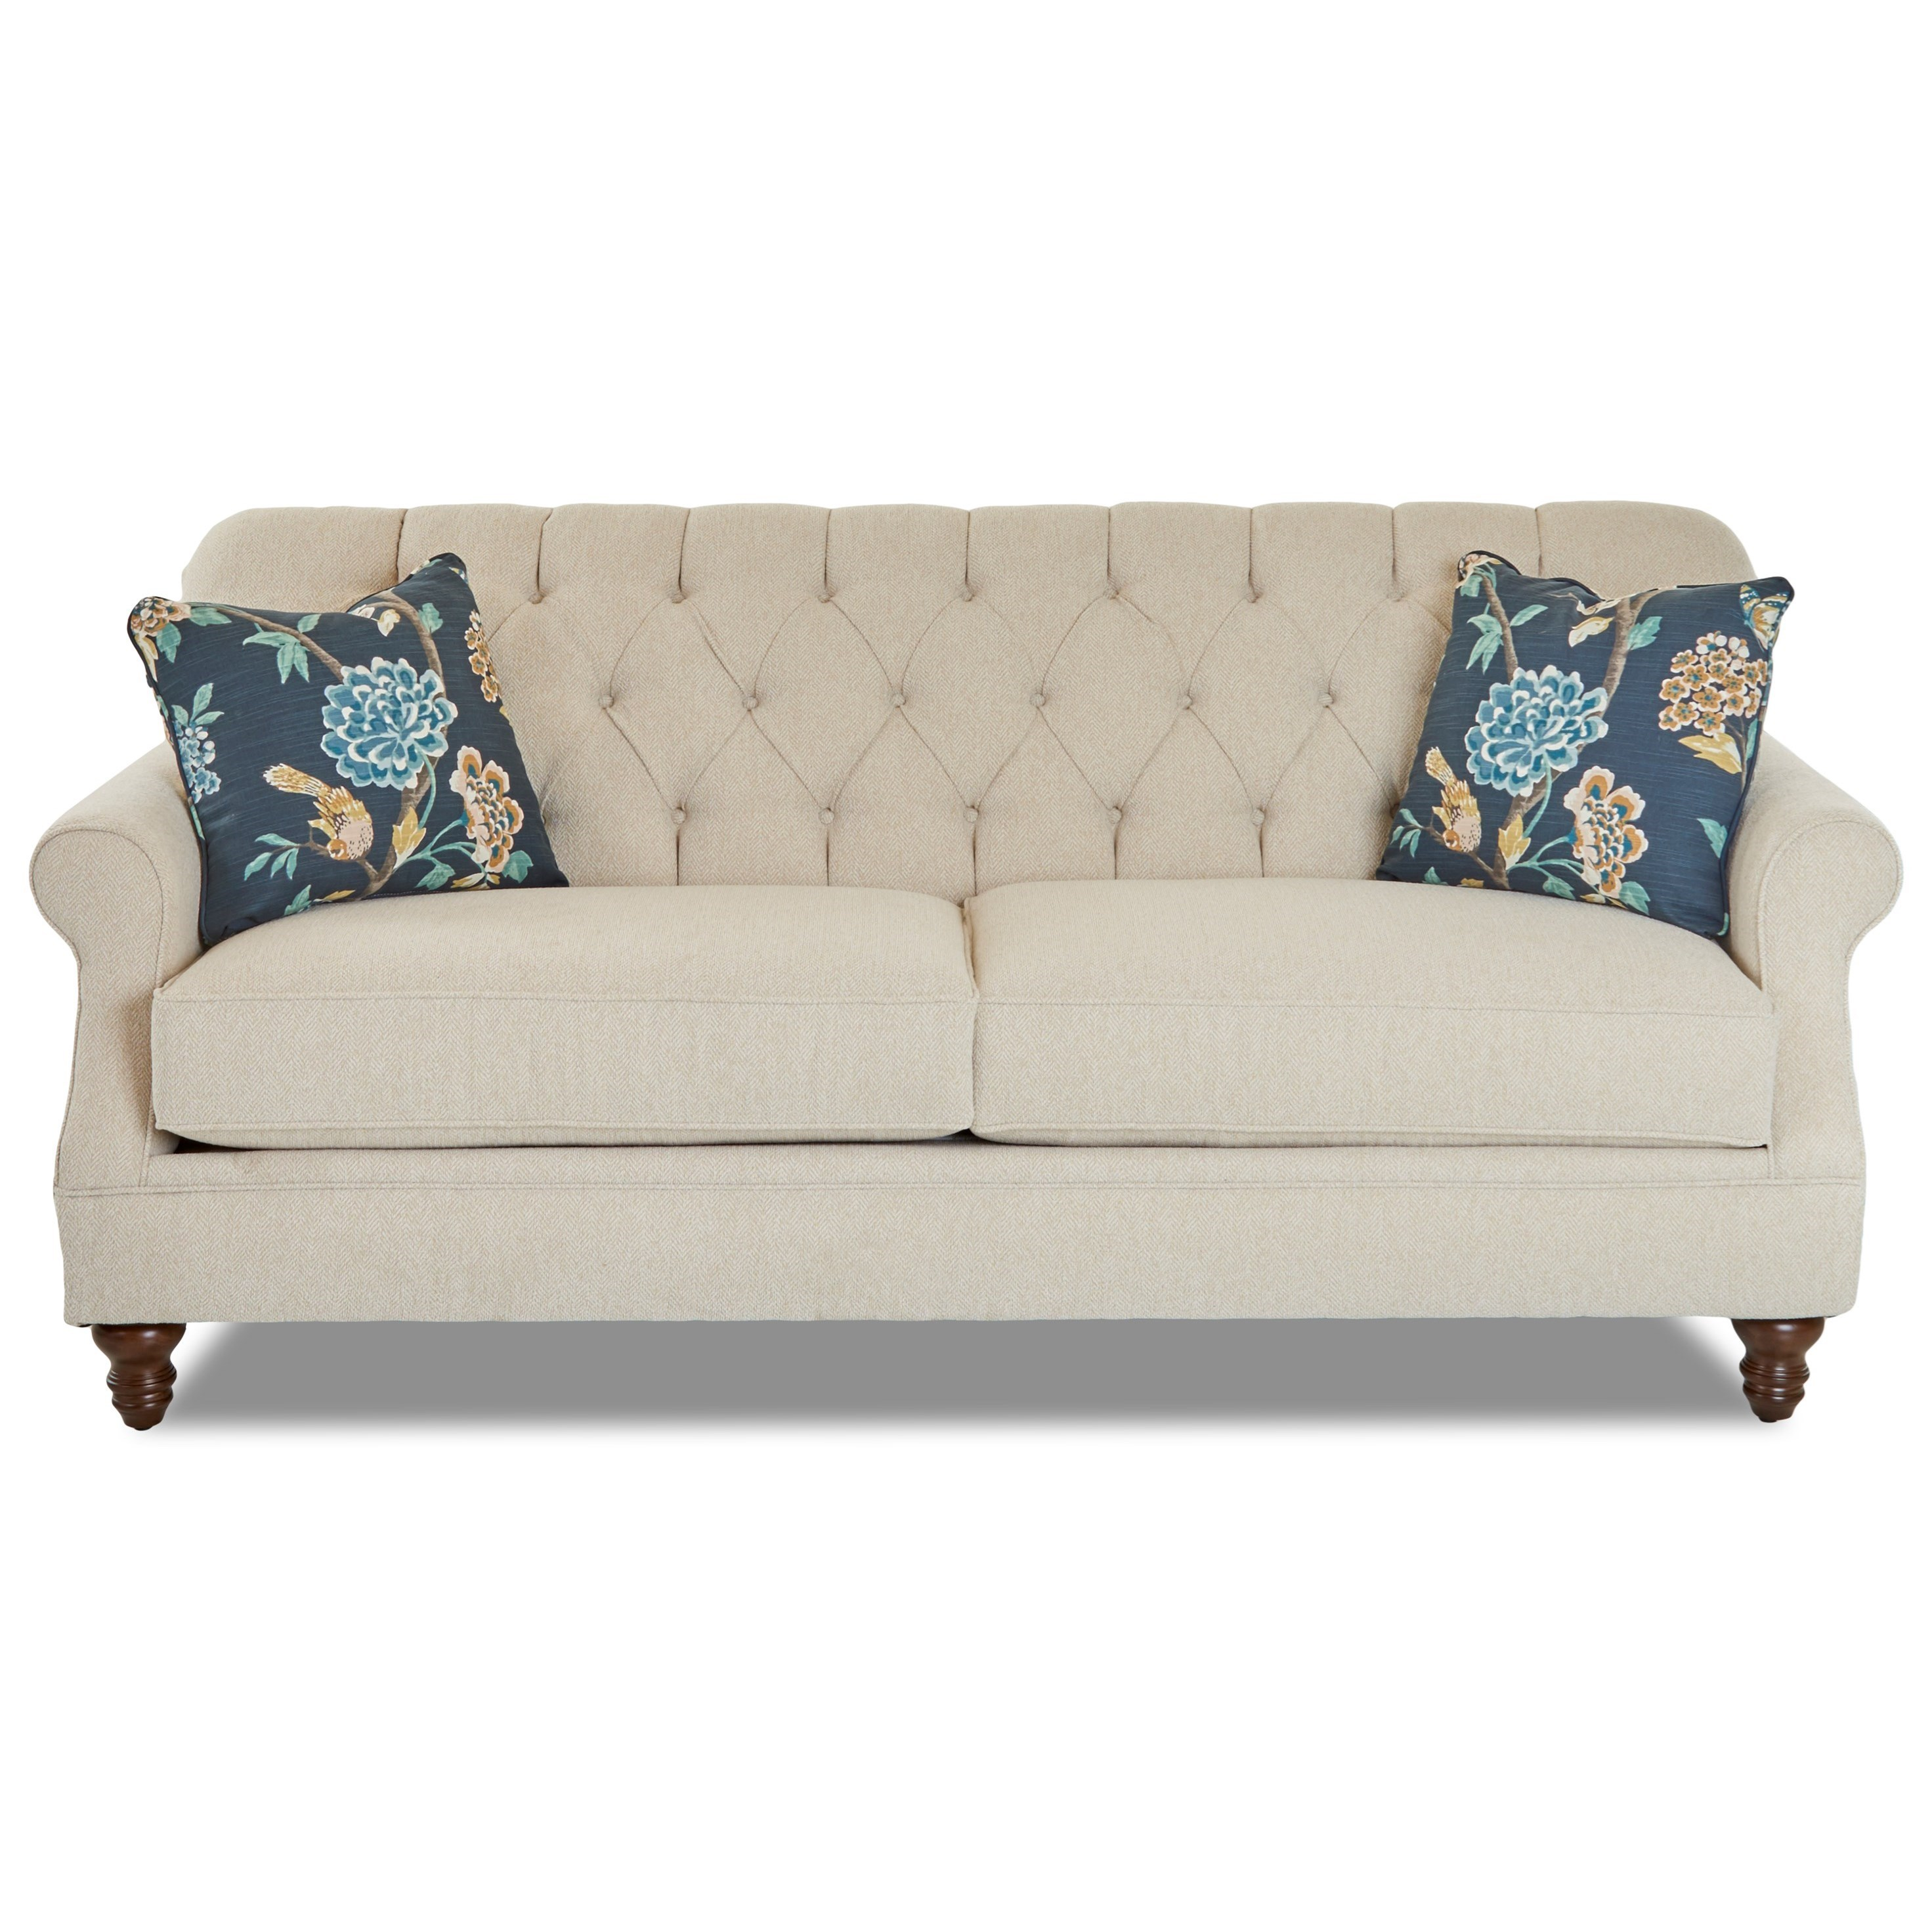 klaussner burbank traditional tufted apartment size sofa jacksonville furniture mart sofas. Black Bedroom Furniture Sets. Home Design Ideas